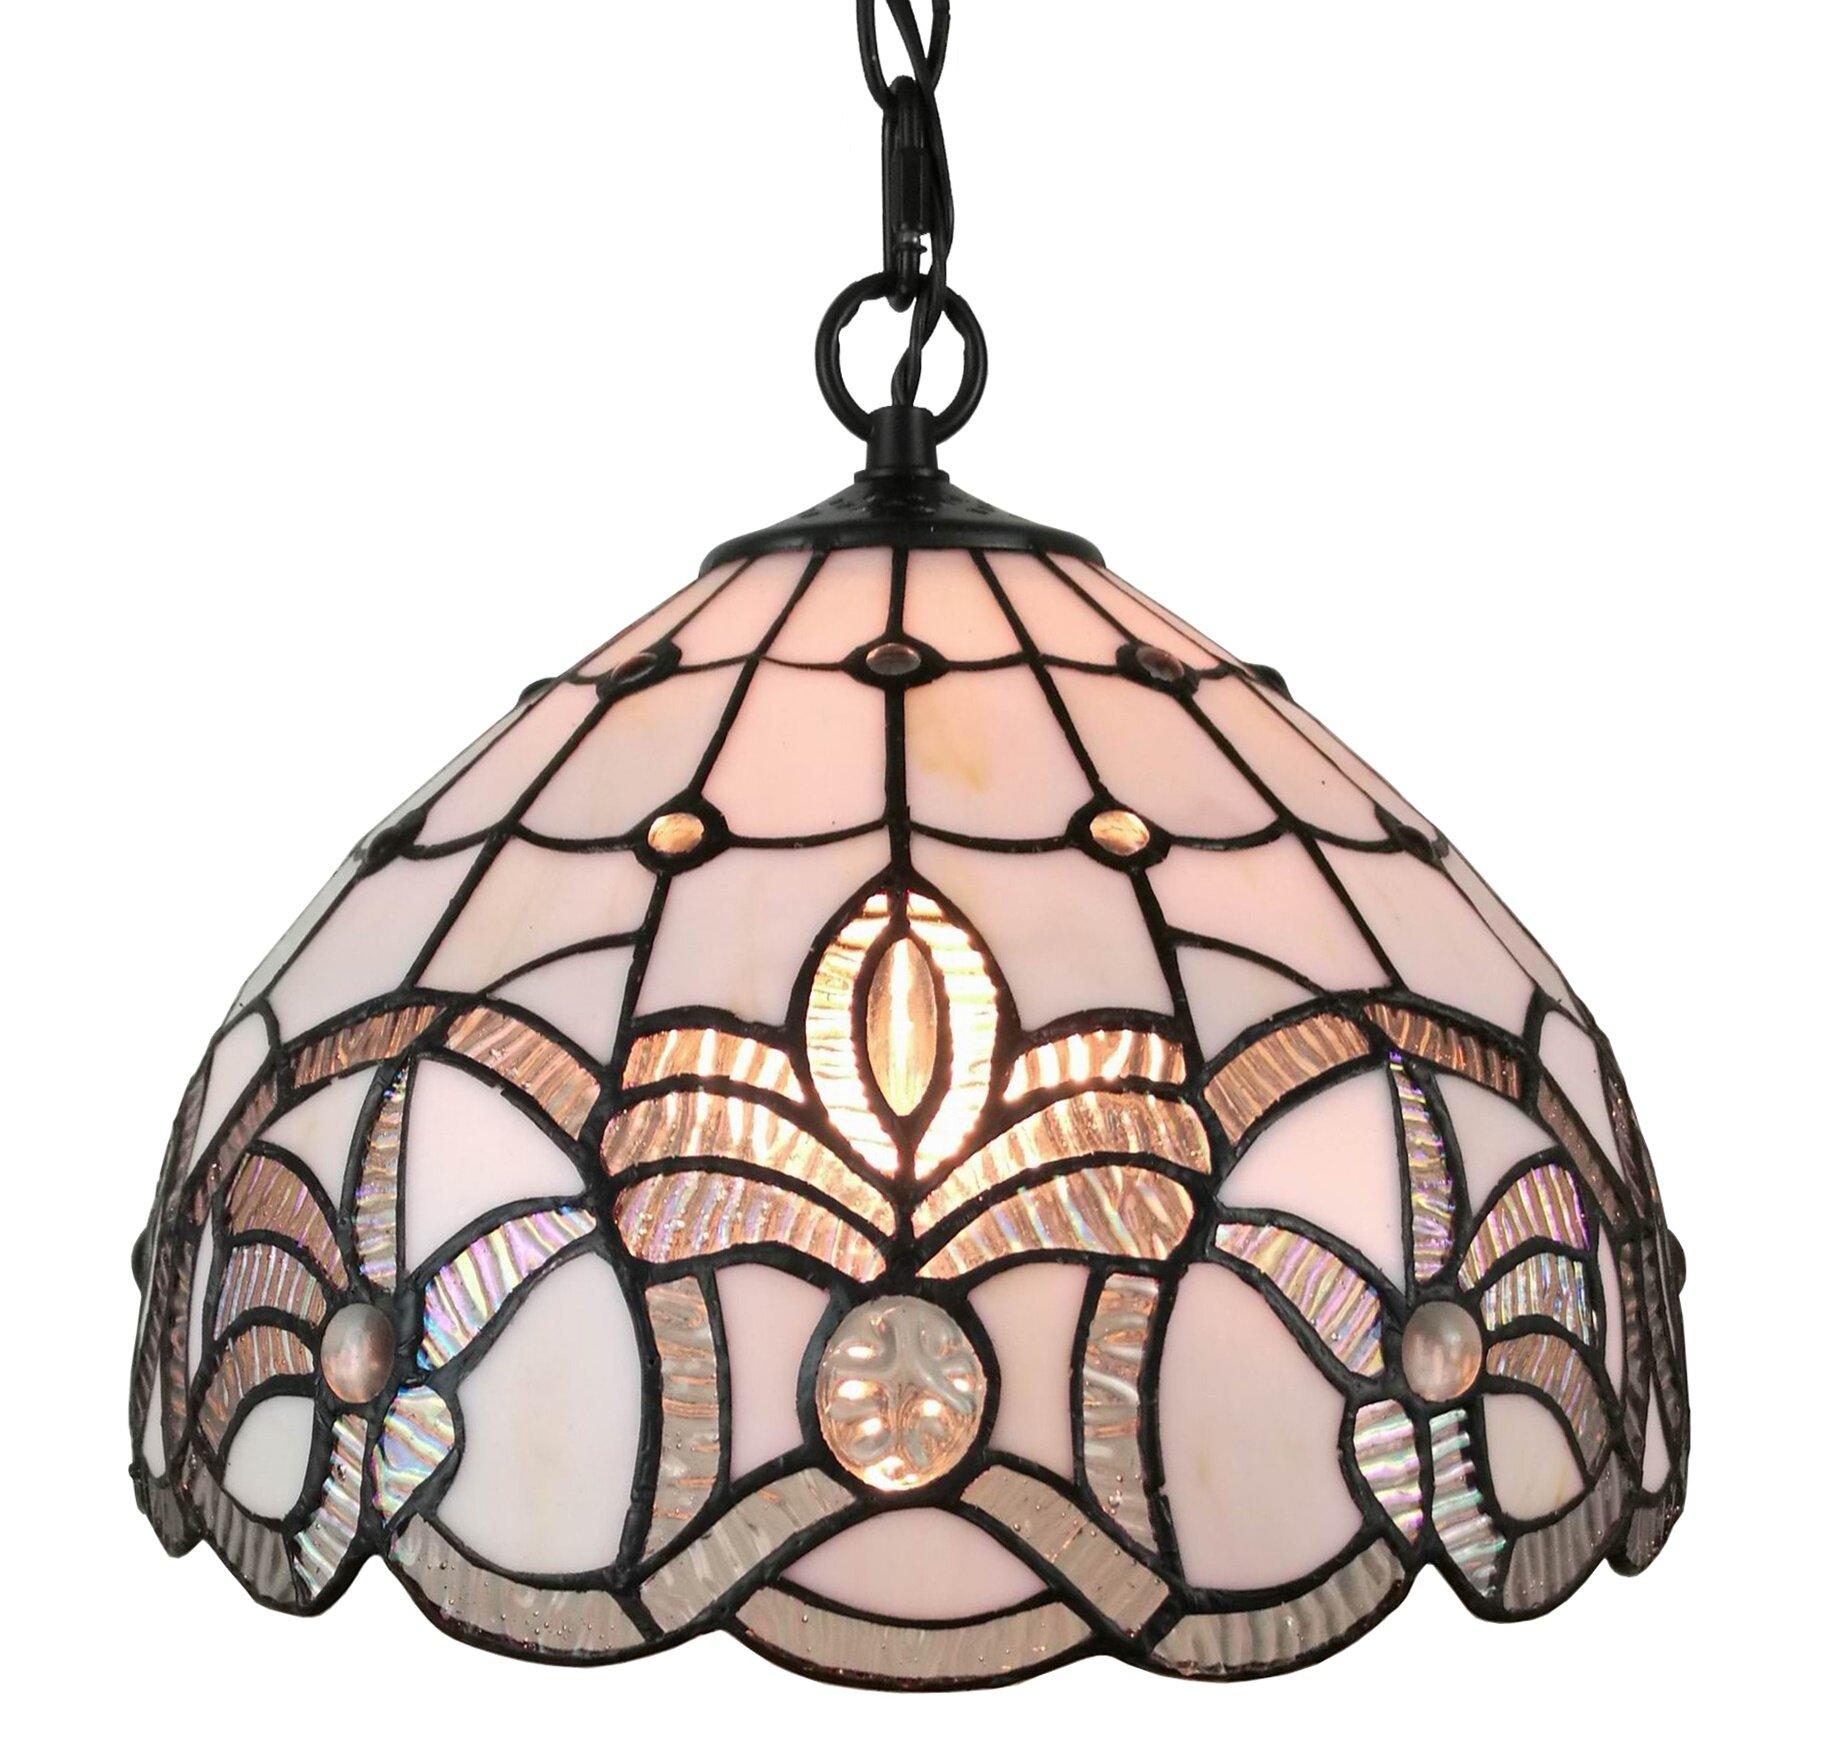 Tiffany style 1 light inverted pendant